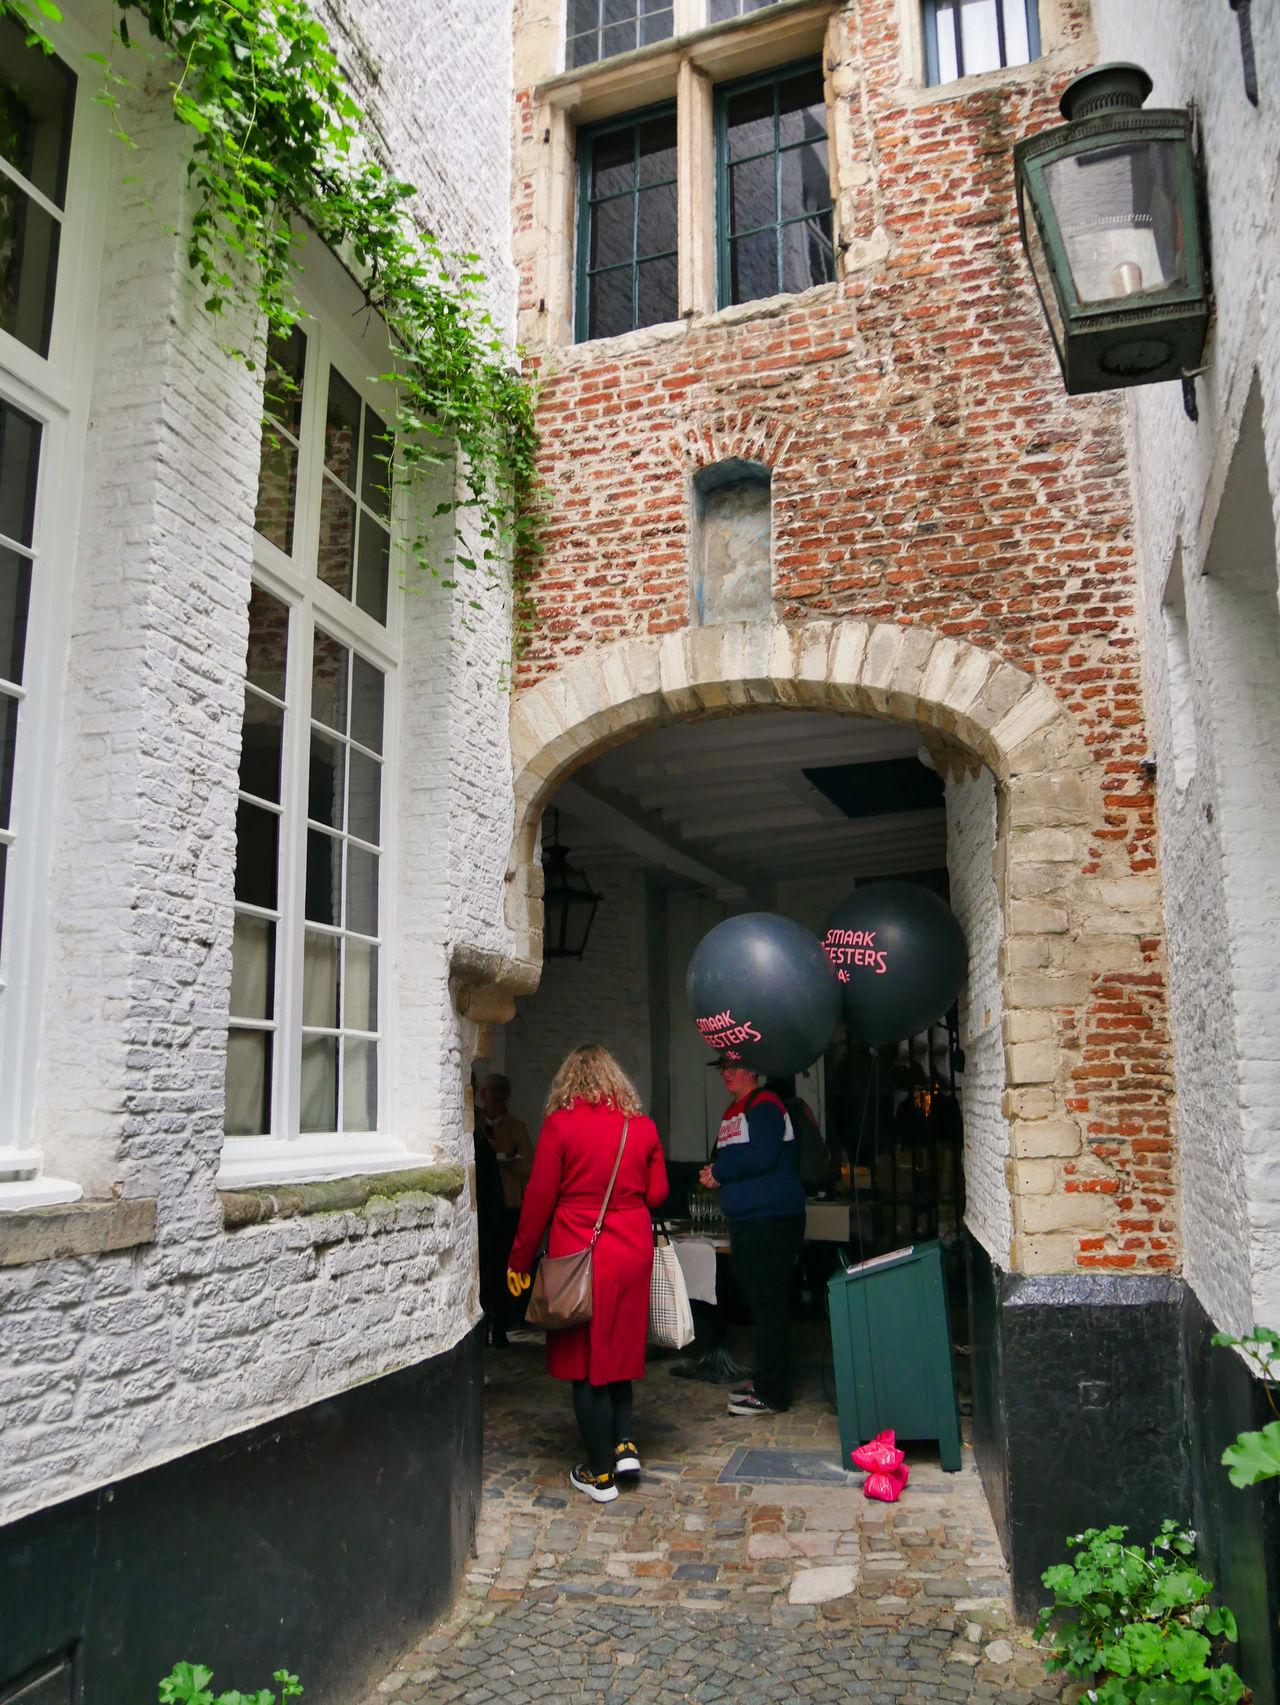 Restaurant Anthony van Dyck Antwerpen